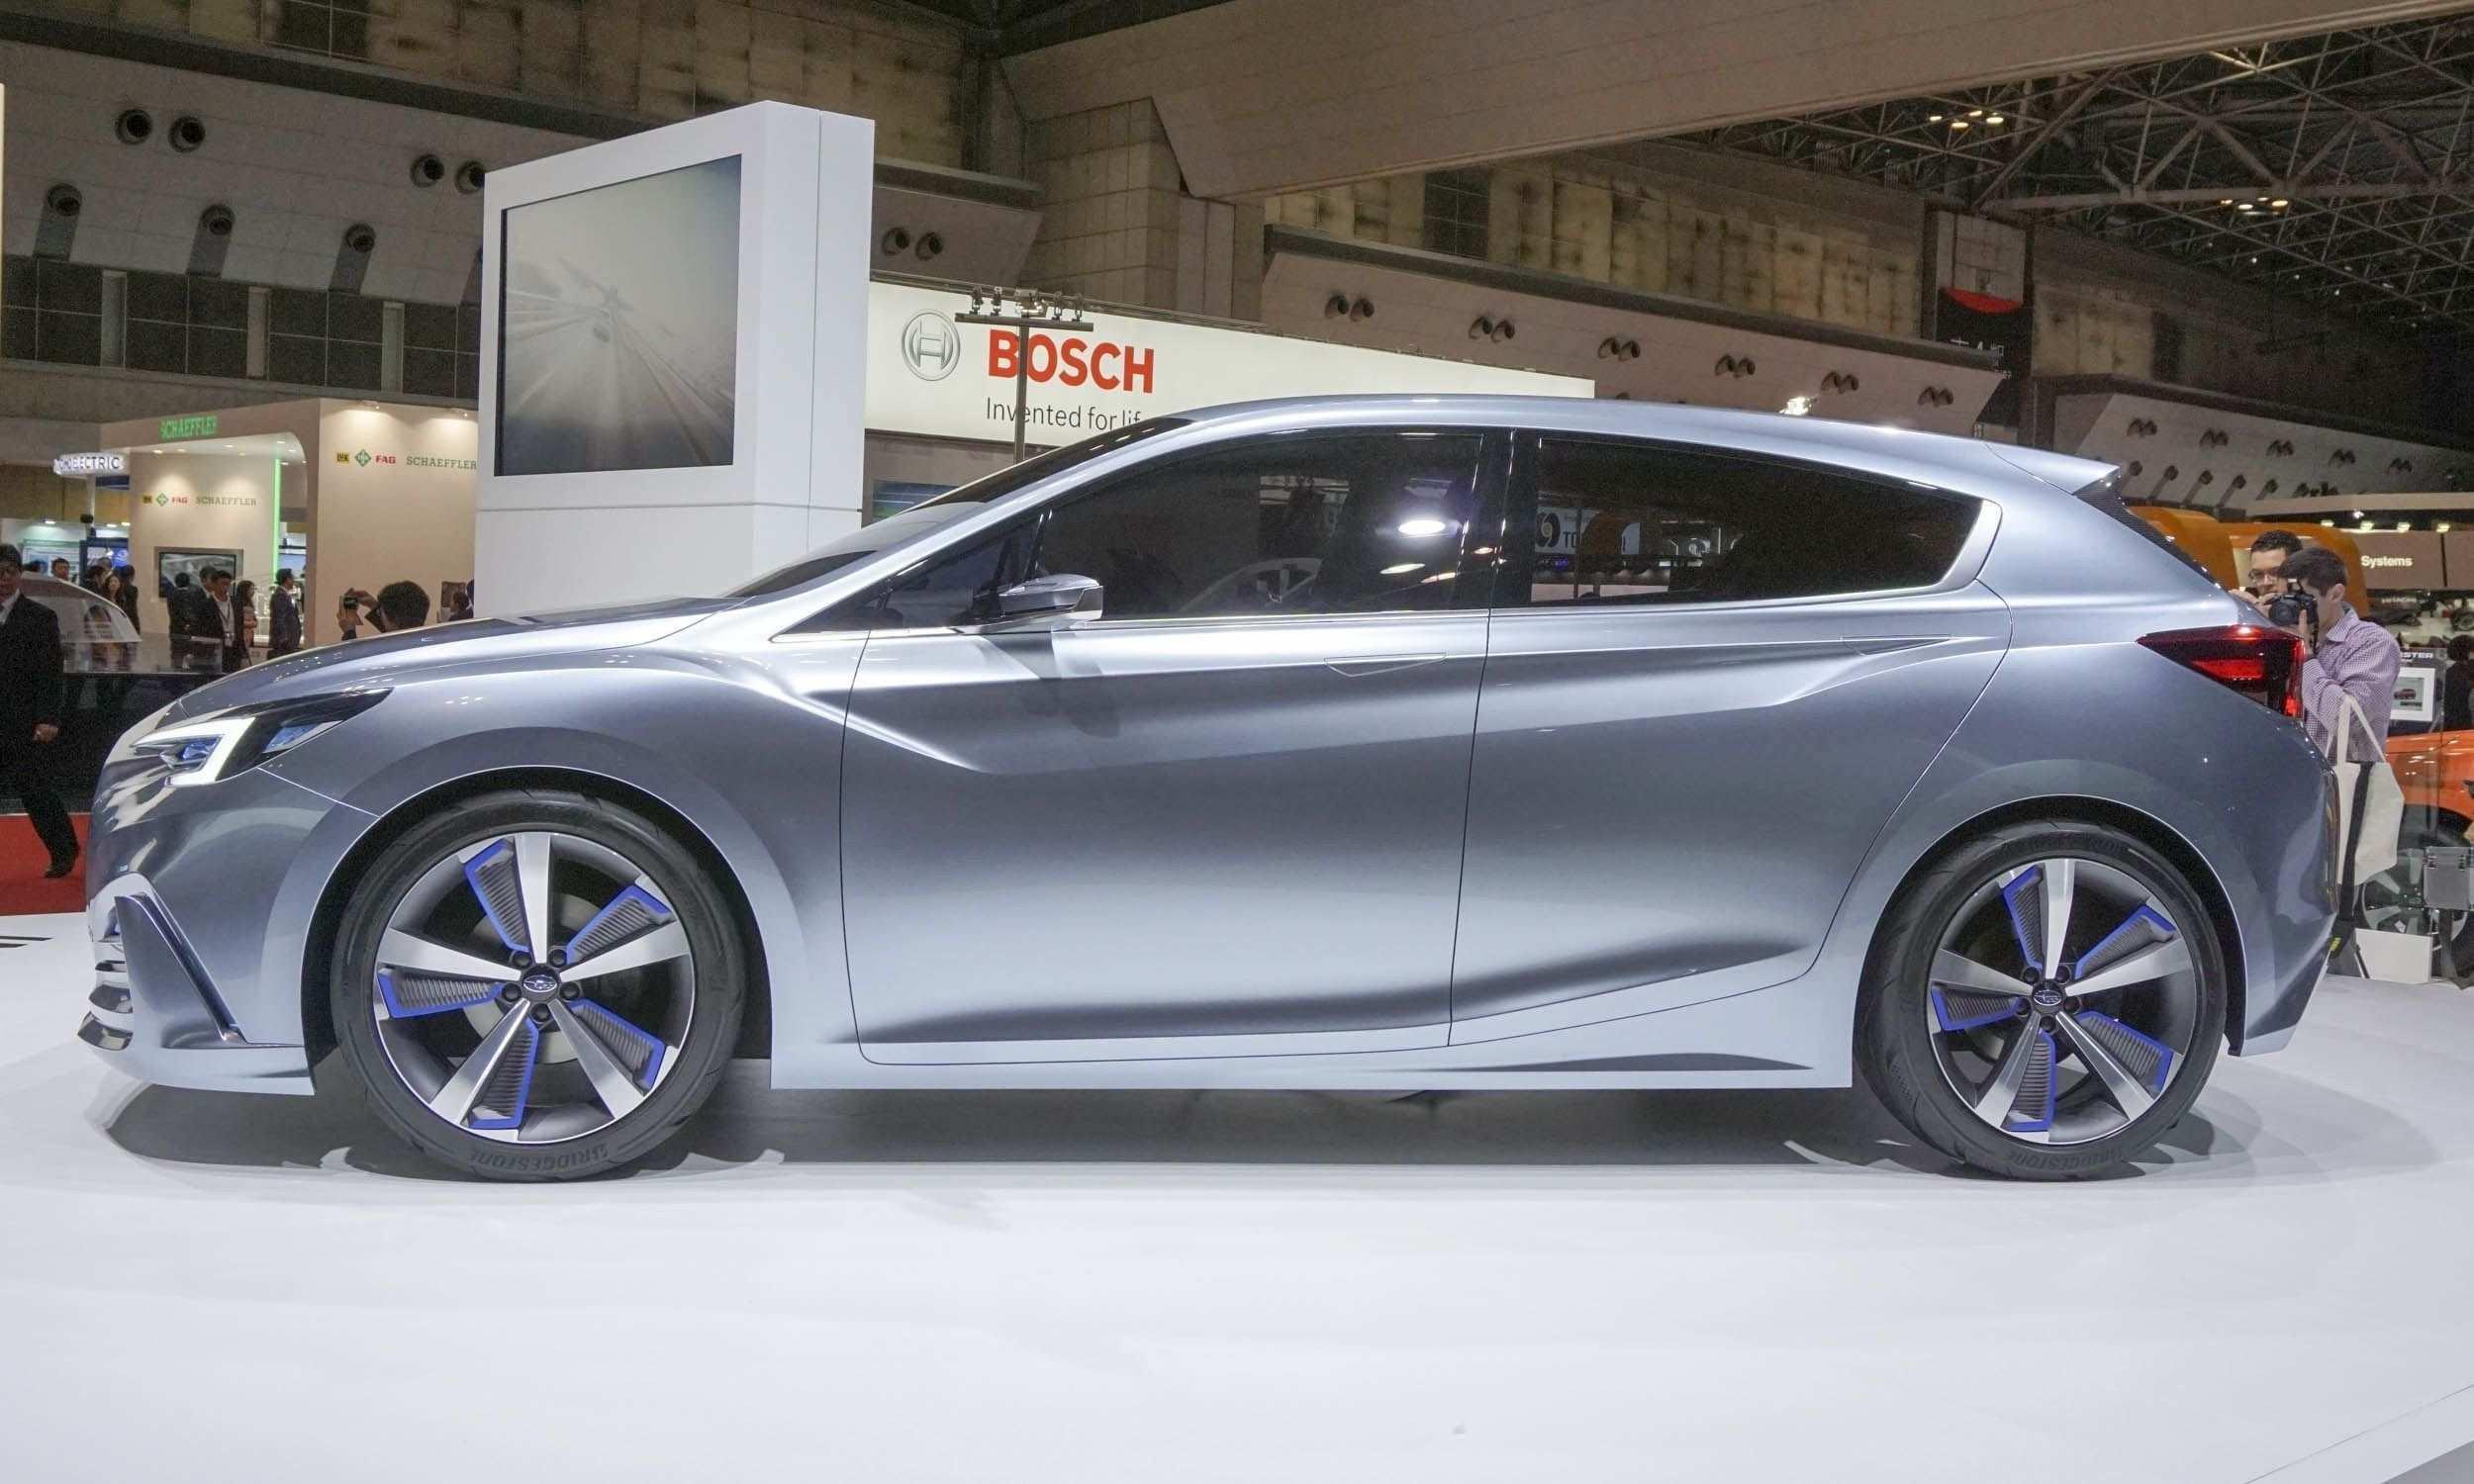 14 New Subaru 2019 Hatchback Concept by Subaru 2019 Hatchback